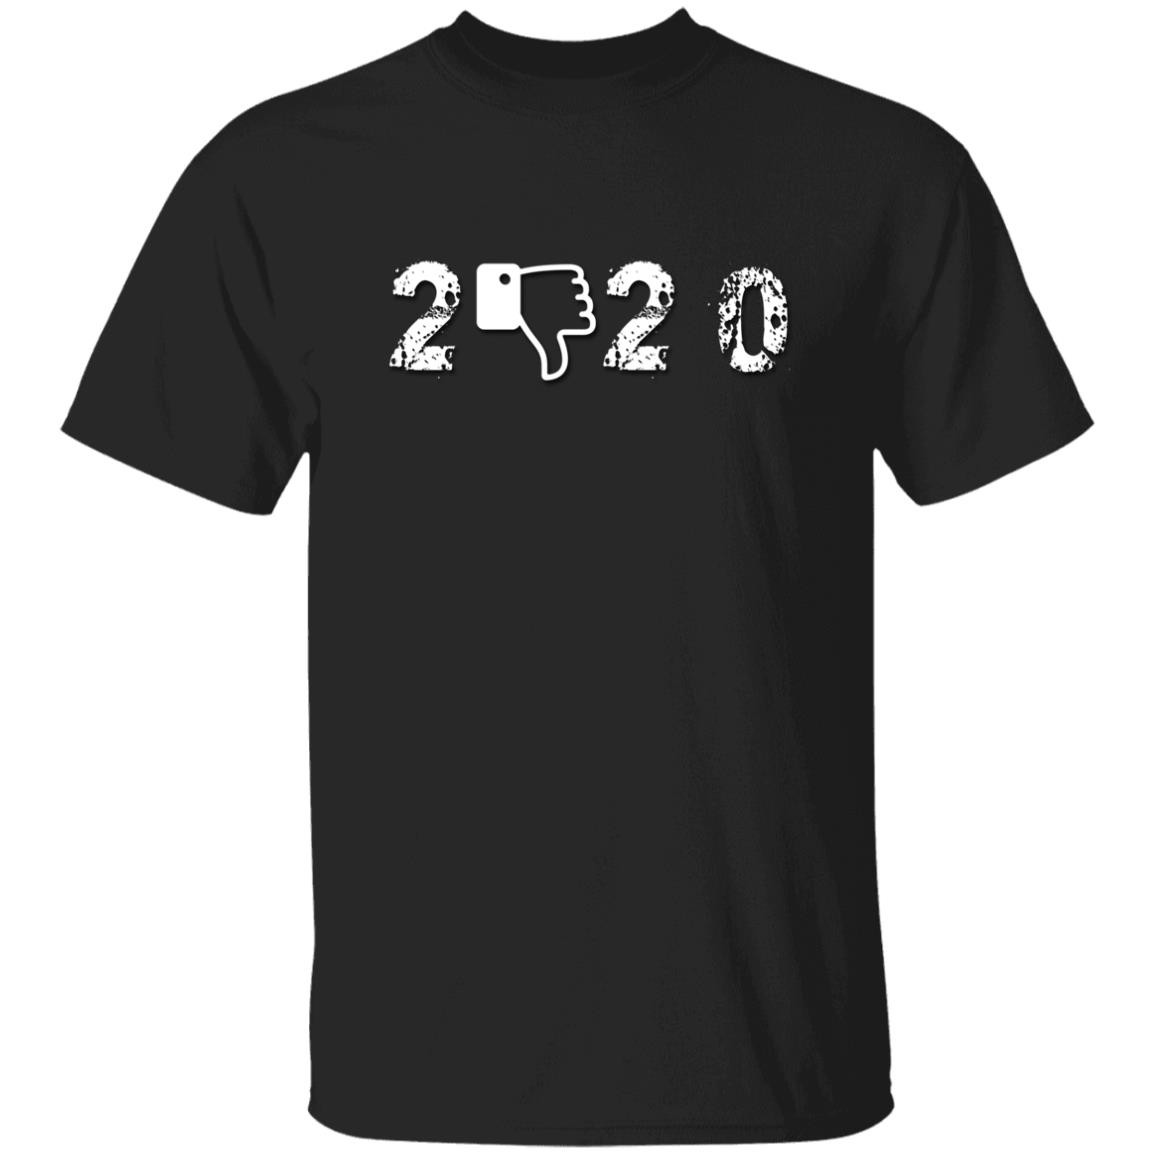 2020 Black Unisex T-Shirt